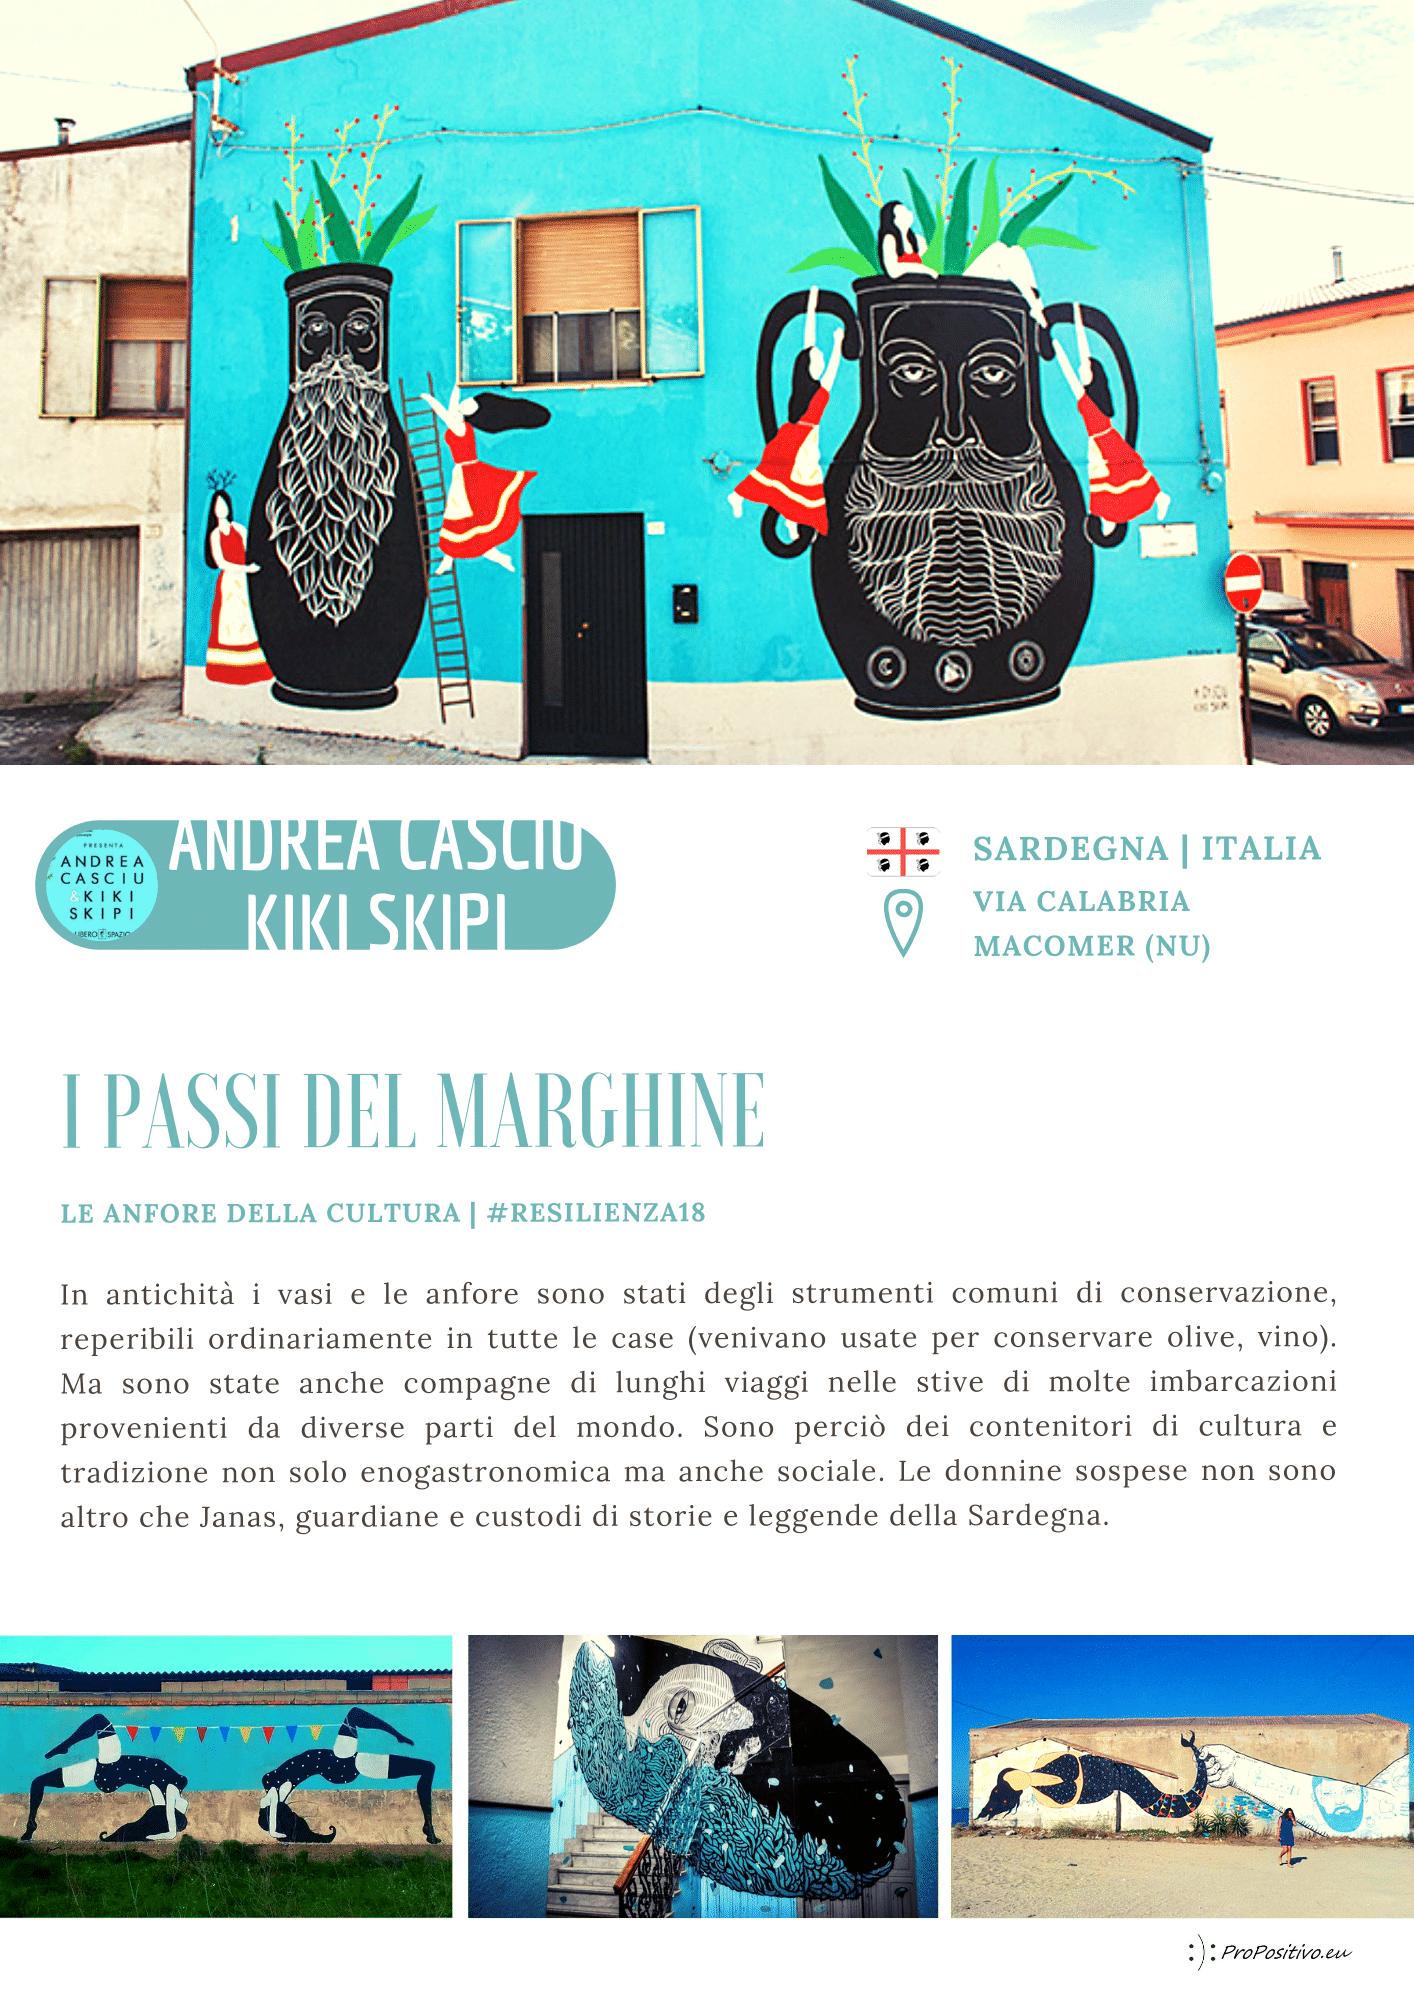 casciu kiki catalogo murales street art macomer sardegna festival resilienza propositivo 20